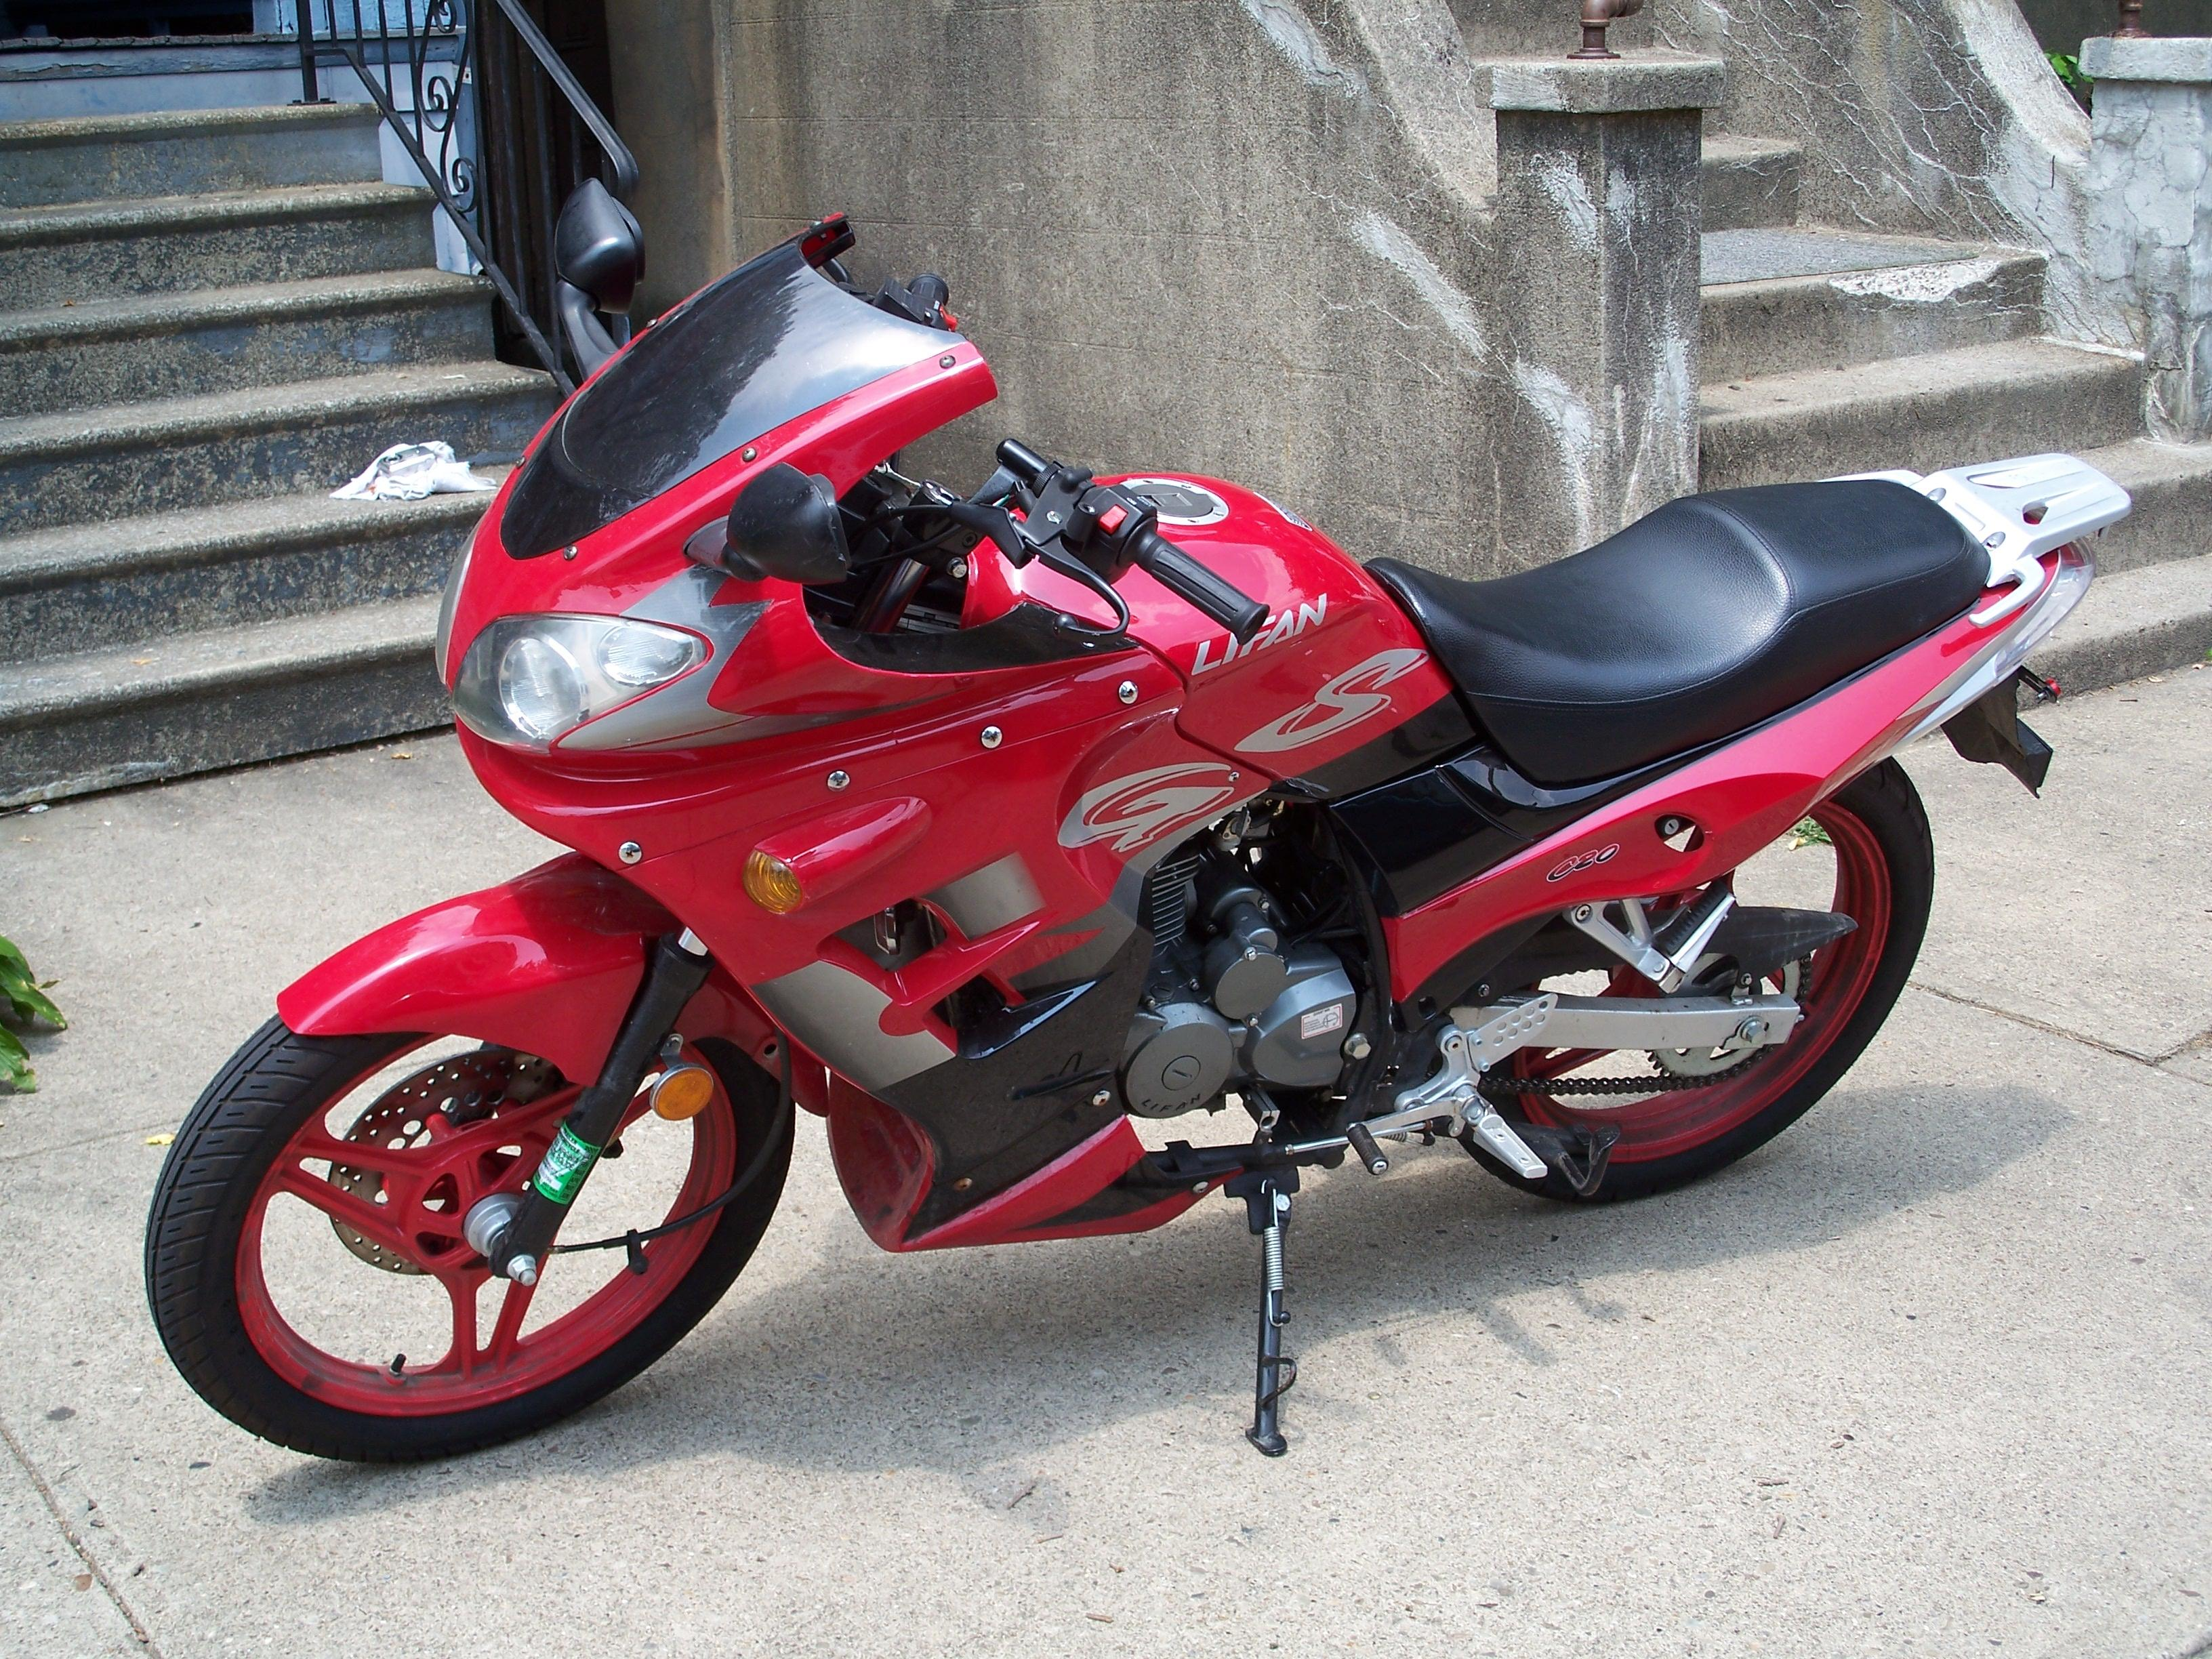 Lifan 200cc Motorcycleon Lifan Engine Wiring Diagram